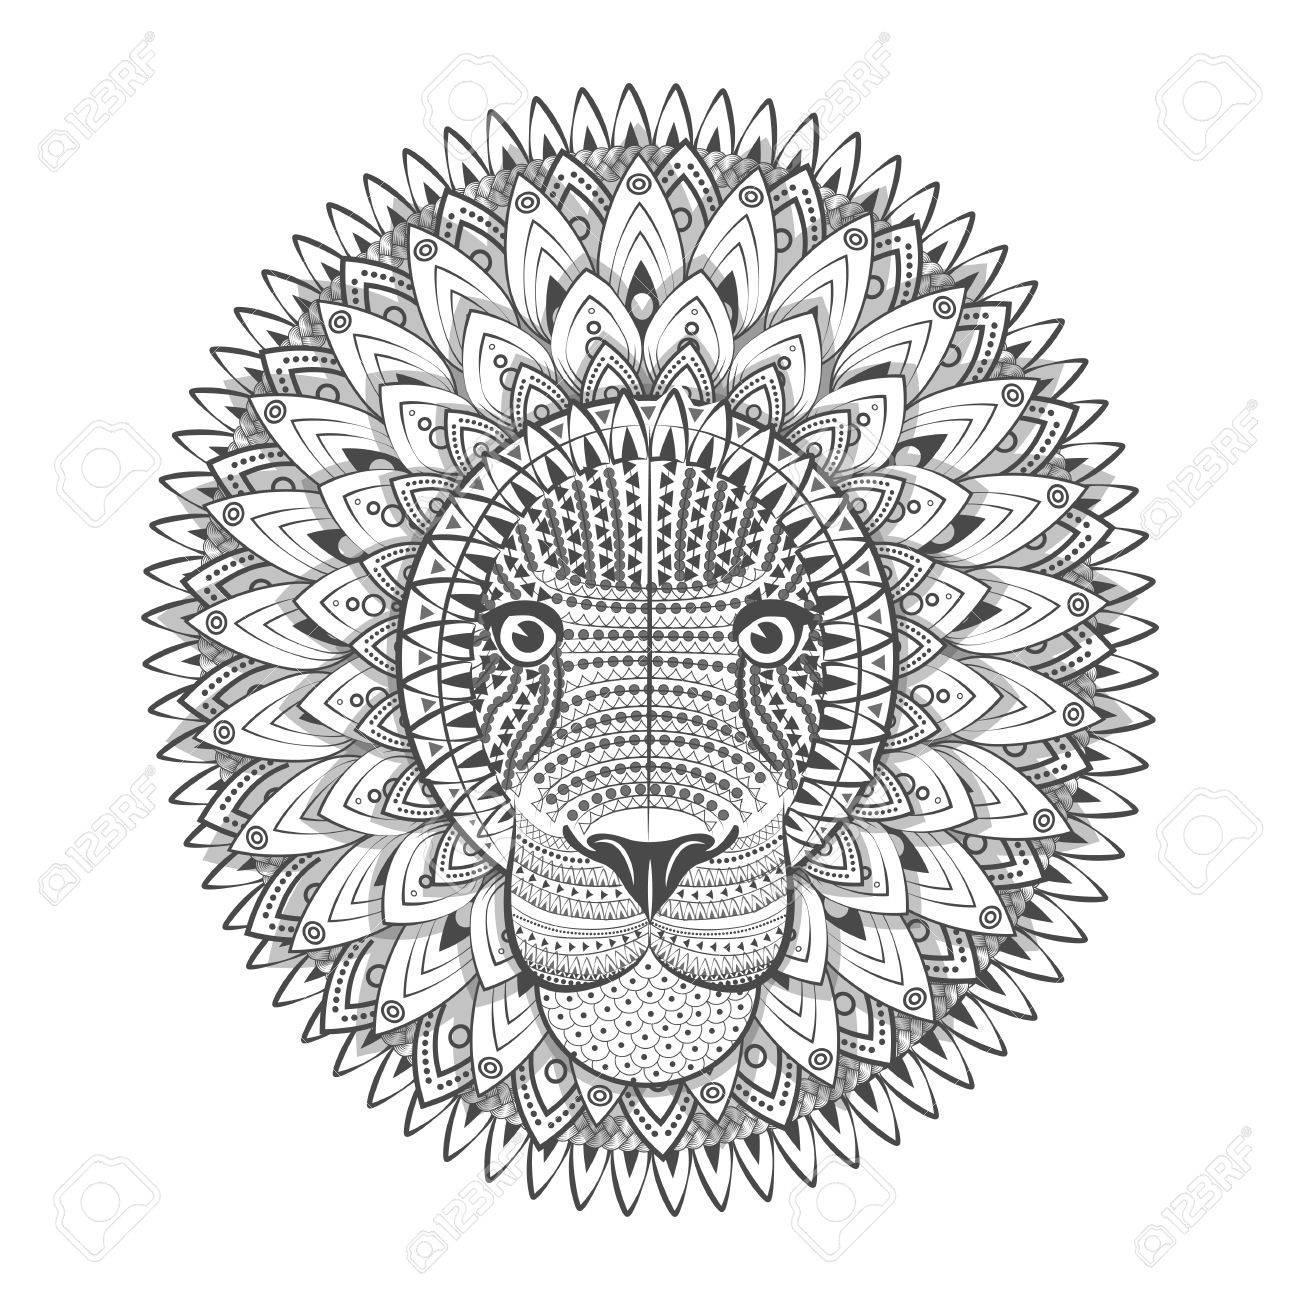 1300x1300 Zentangle Ornate Lion. Tattoo Sketch Vector Illustration. Doodle